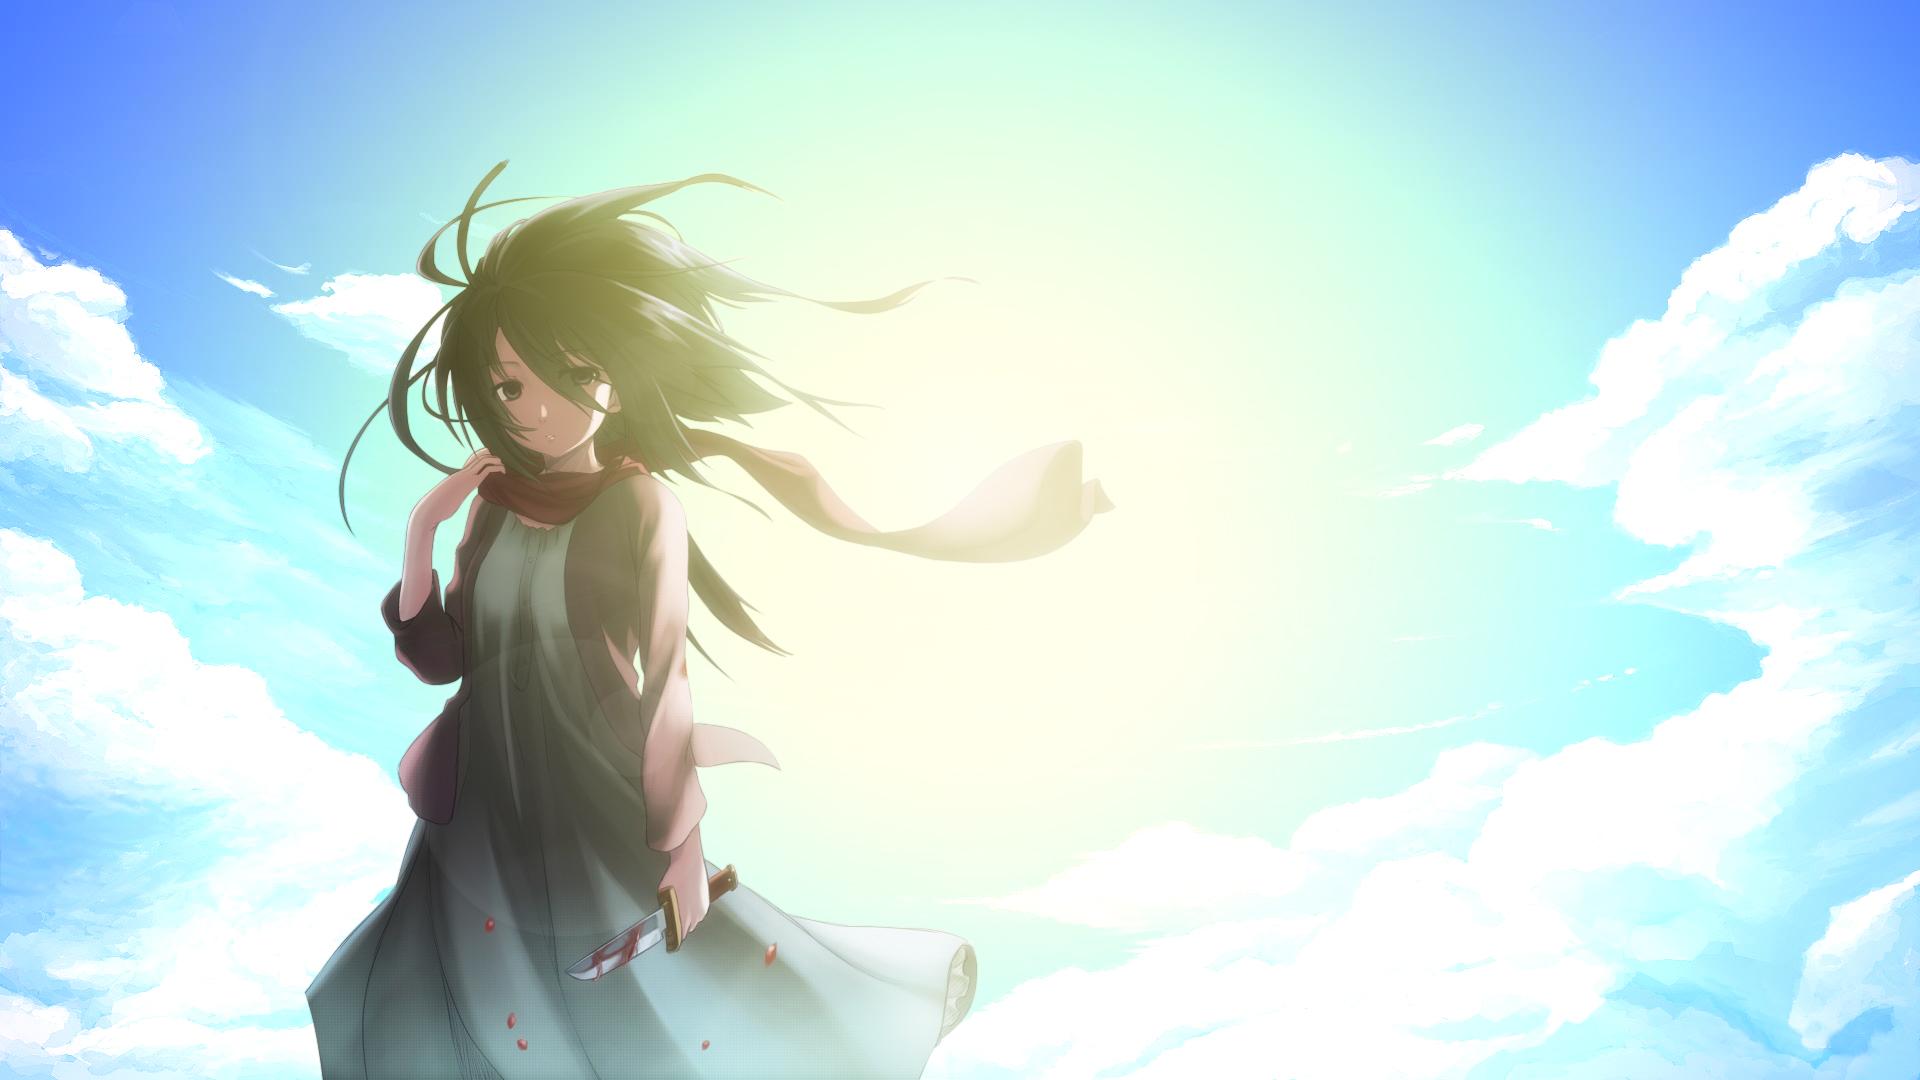 Mikasa Ackerman Wallpaper by girkua